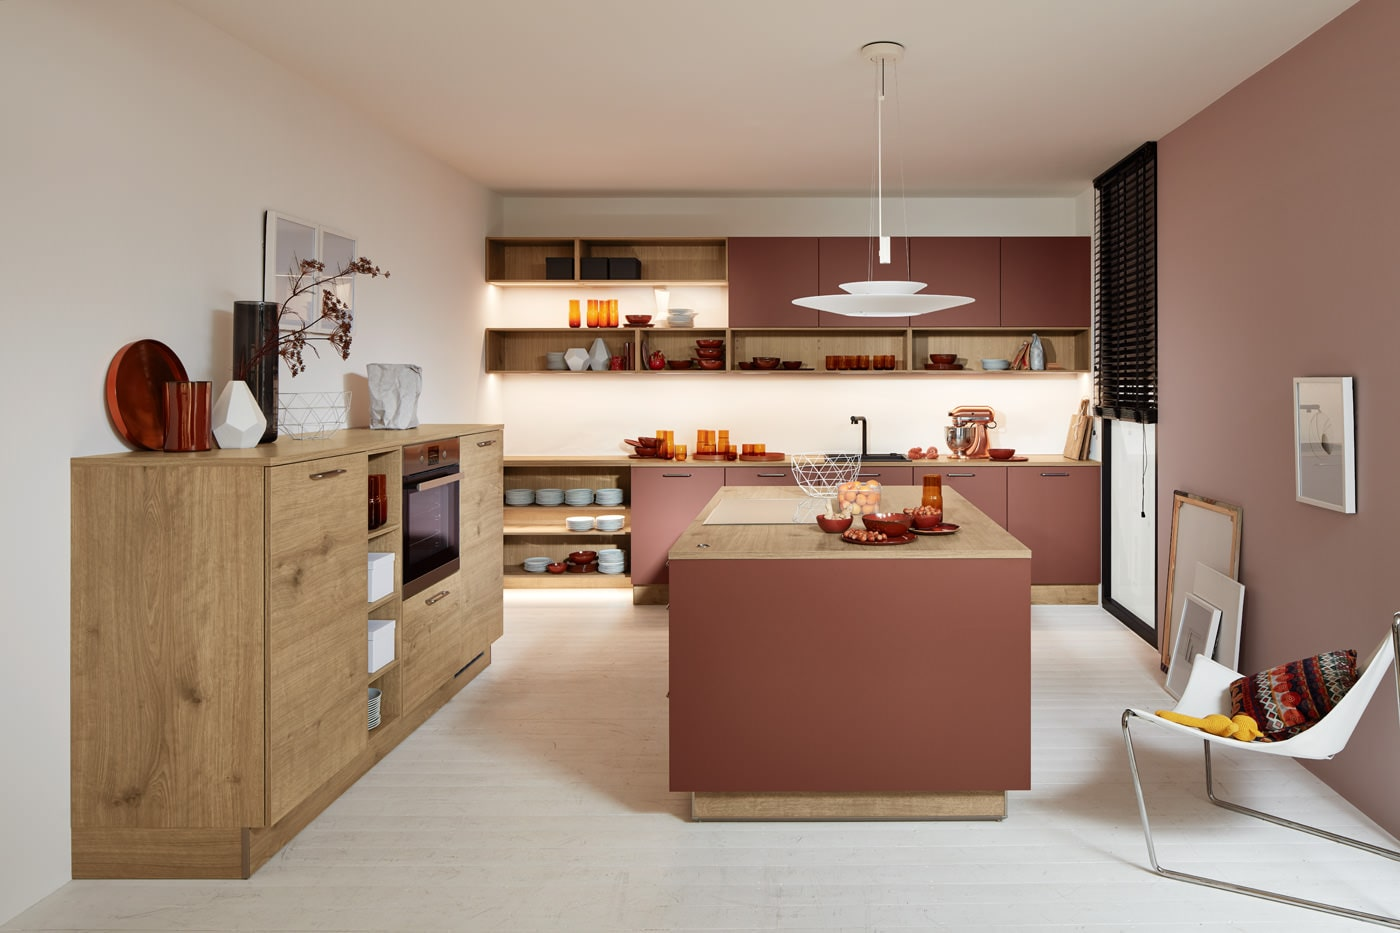 Moderne keuken met mooie kleuraccenten